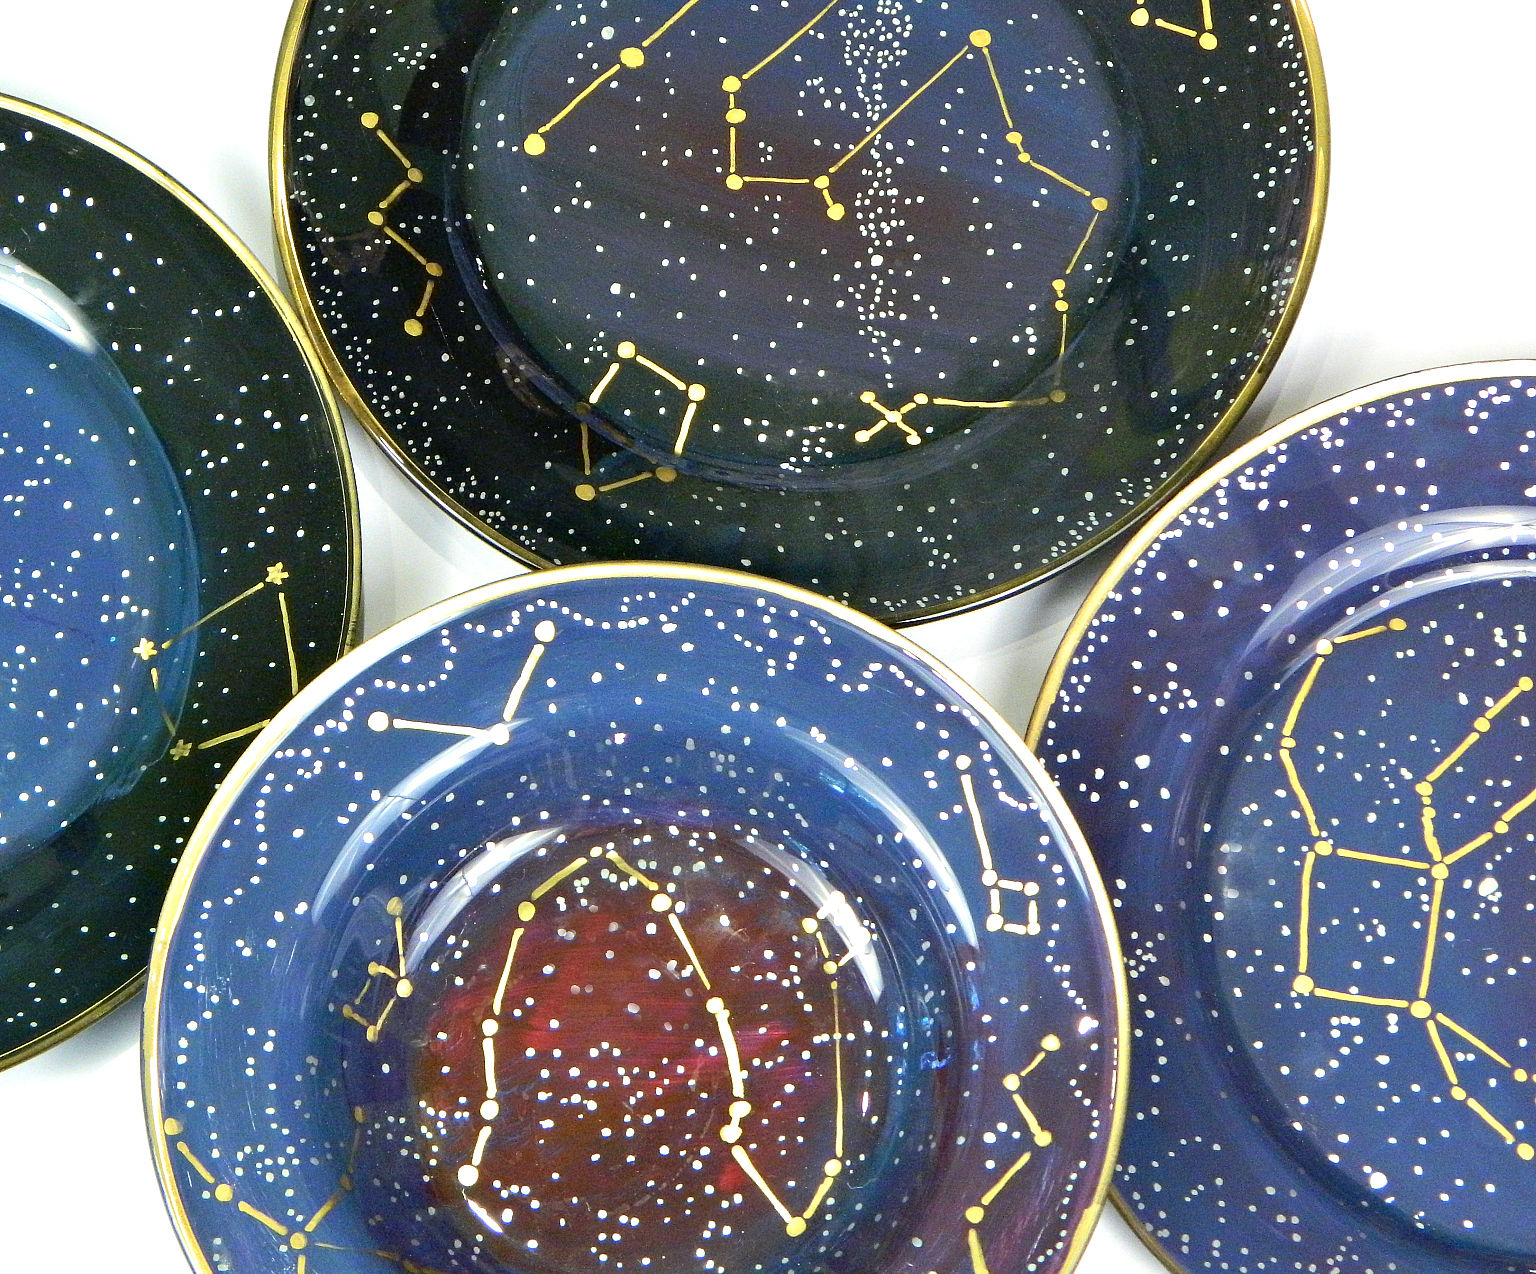 Constellation Dishes